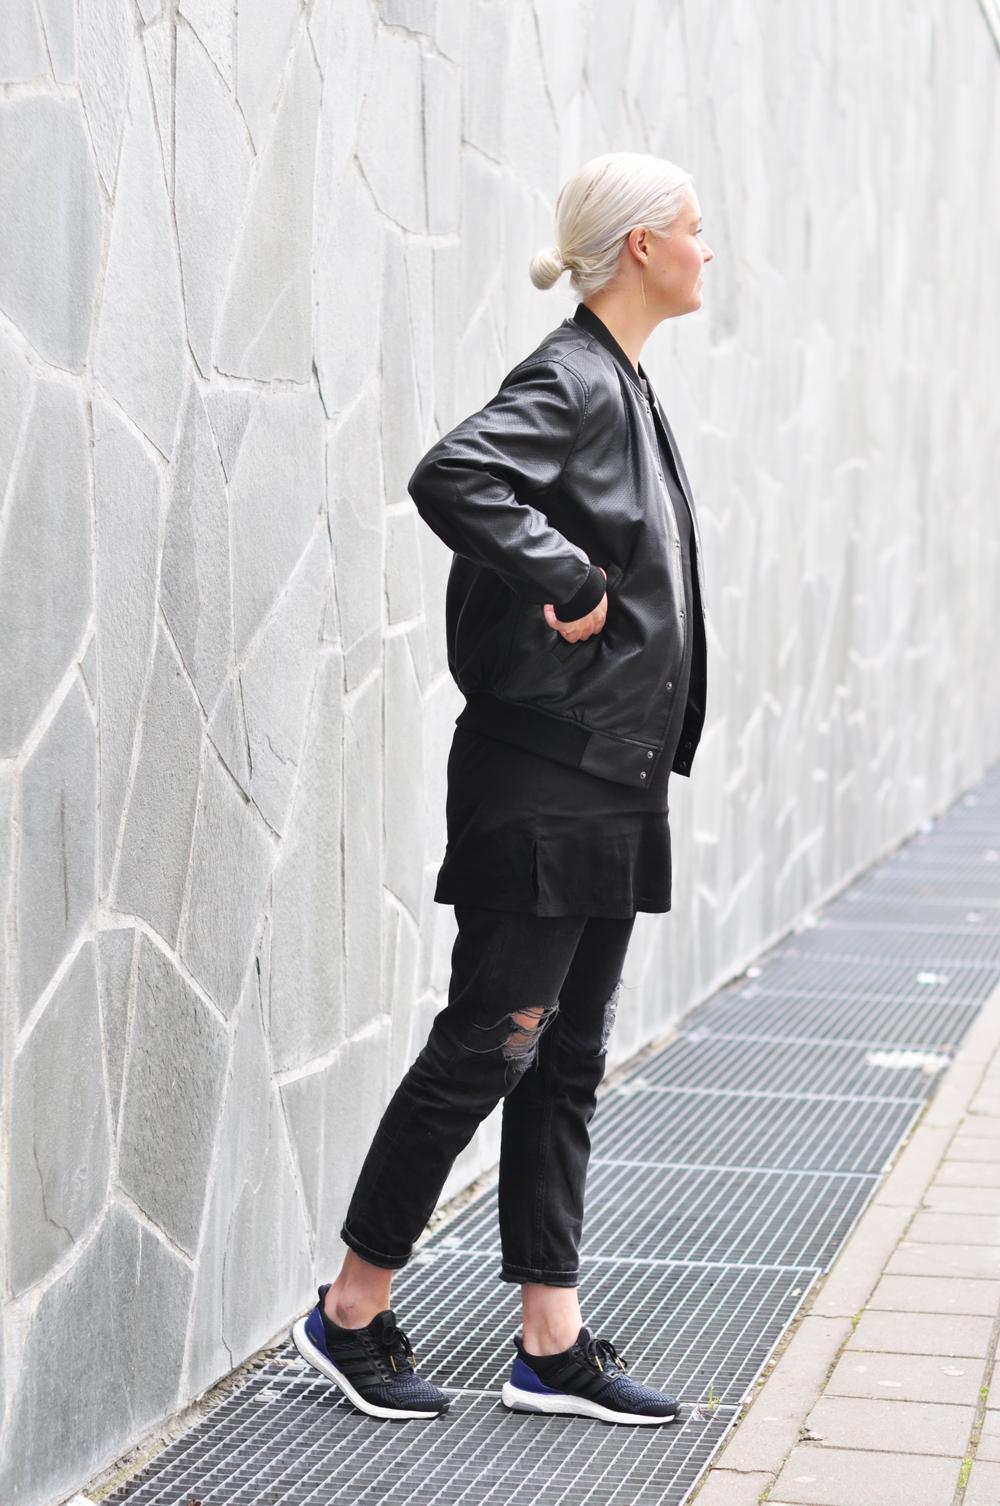 Adidas Ultra Boost - Girl on kicks